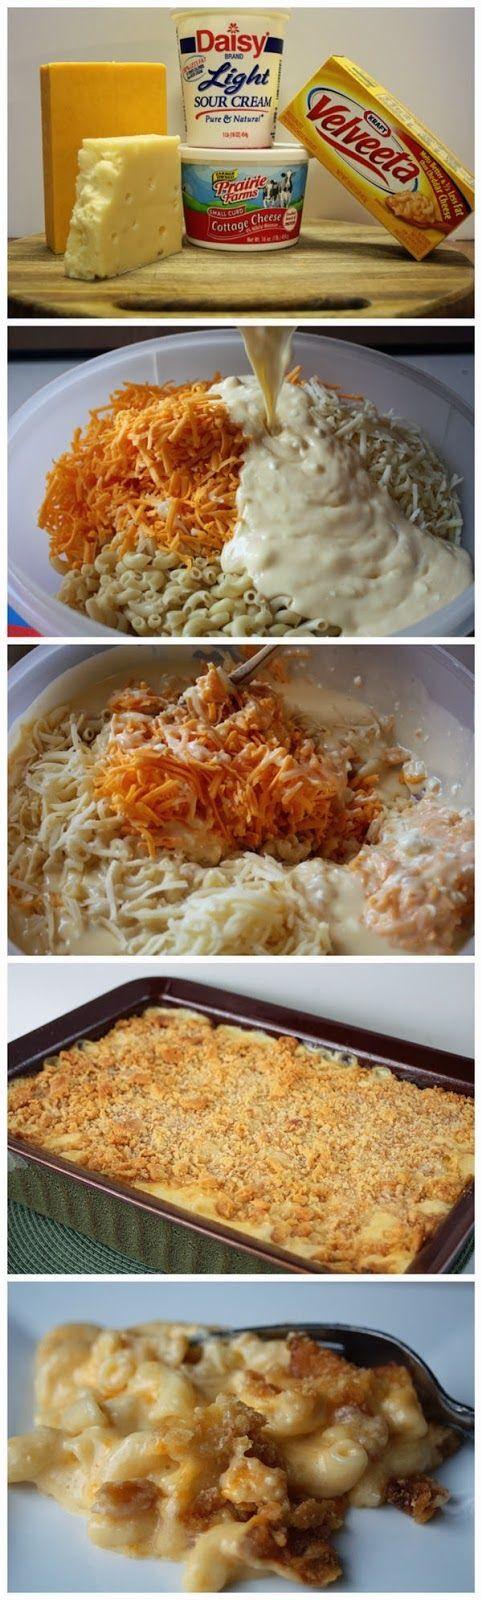 Homemade Macaroni and Cheese: what a Wonderful, Terrible idea!!!